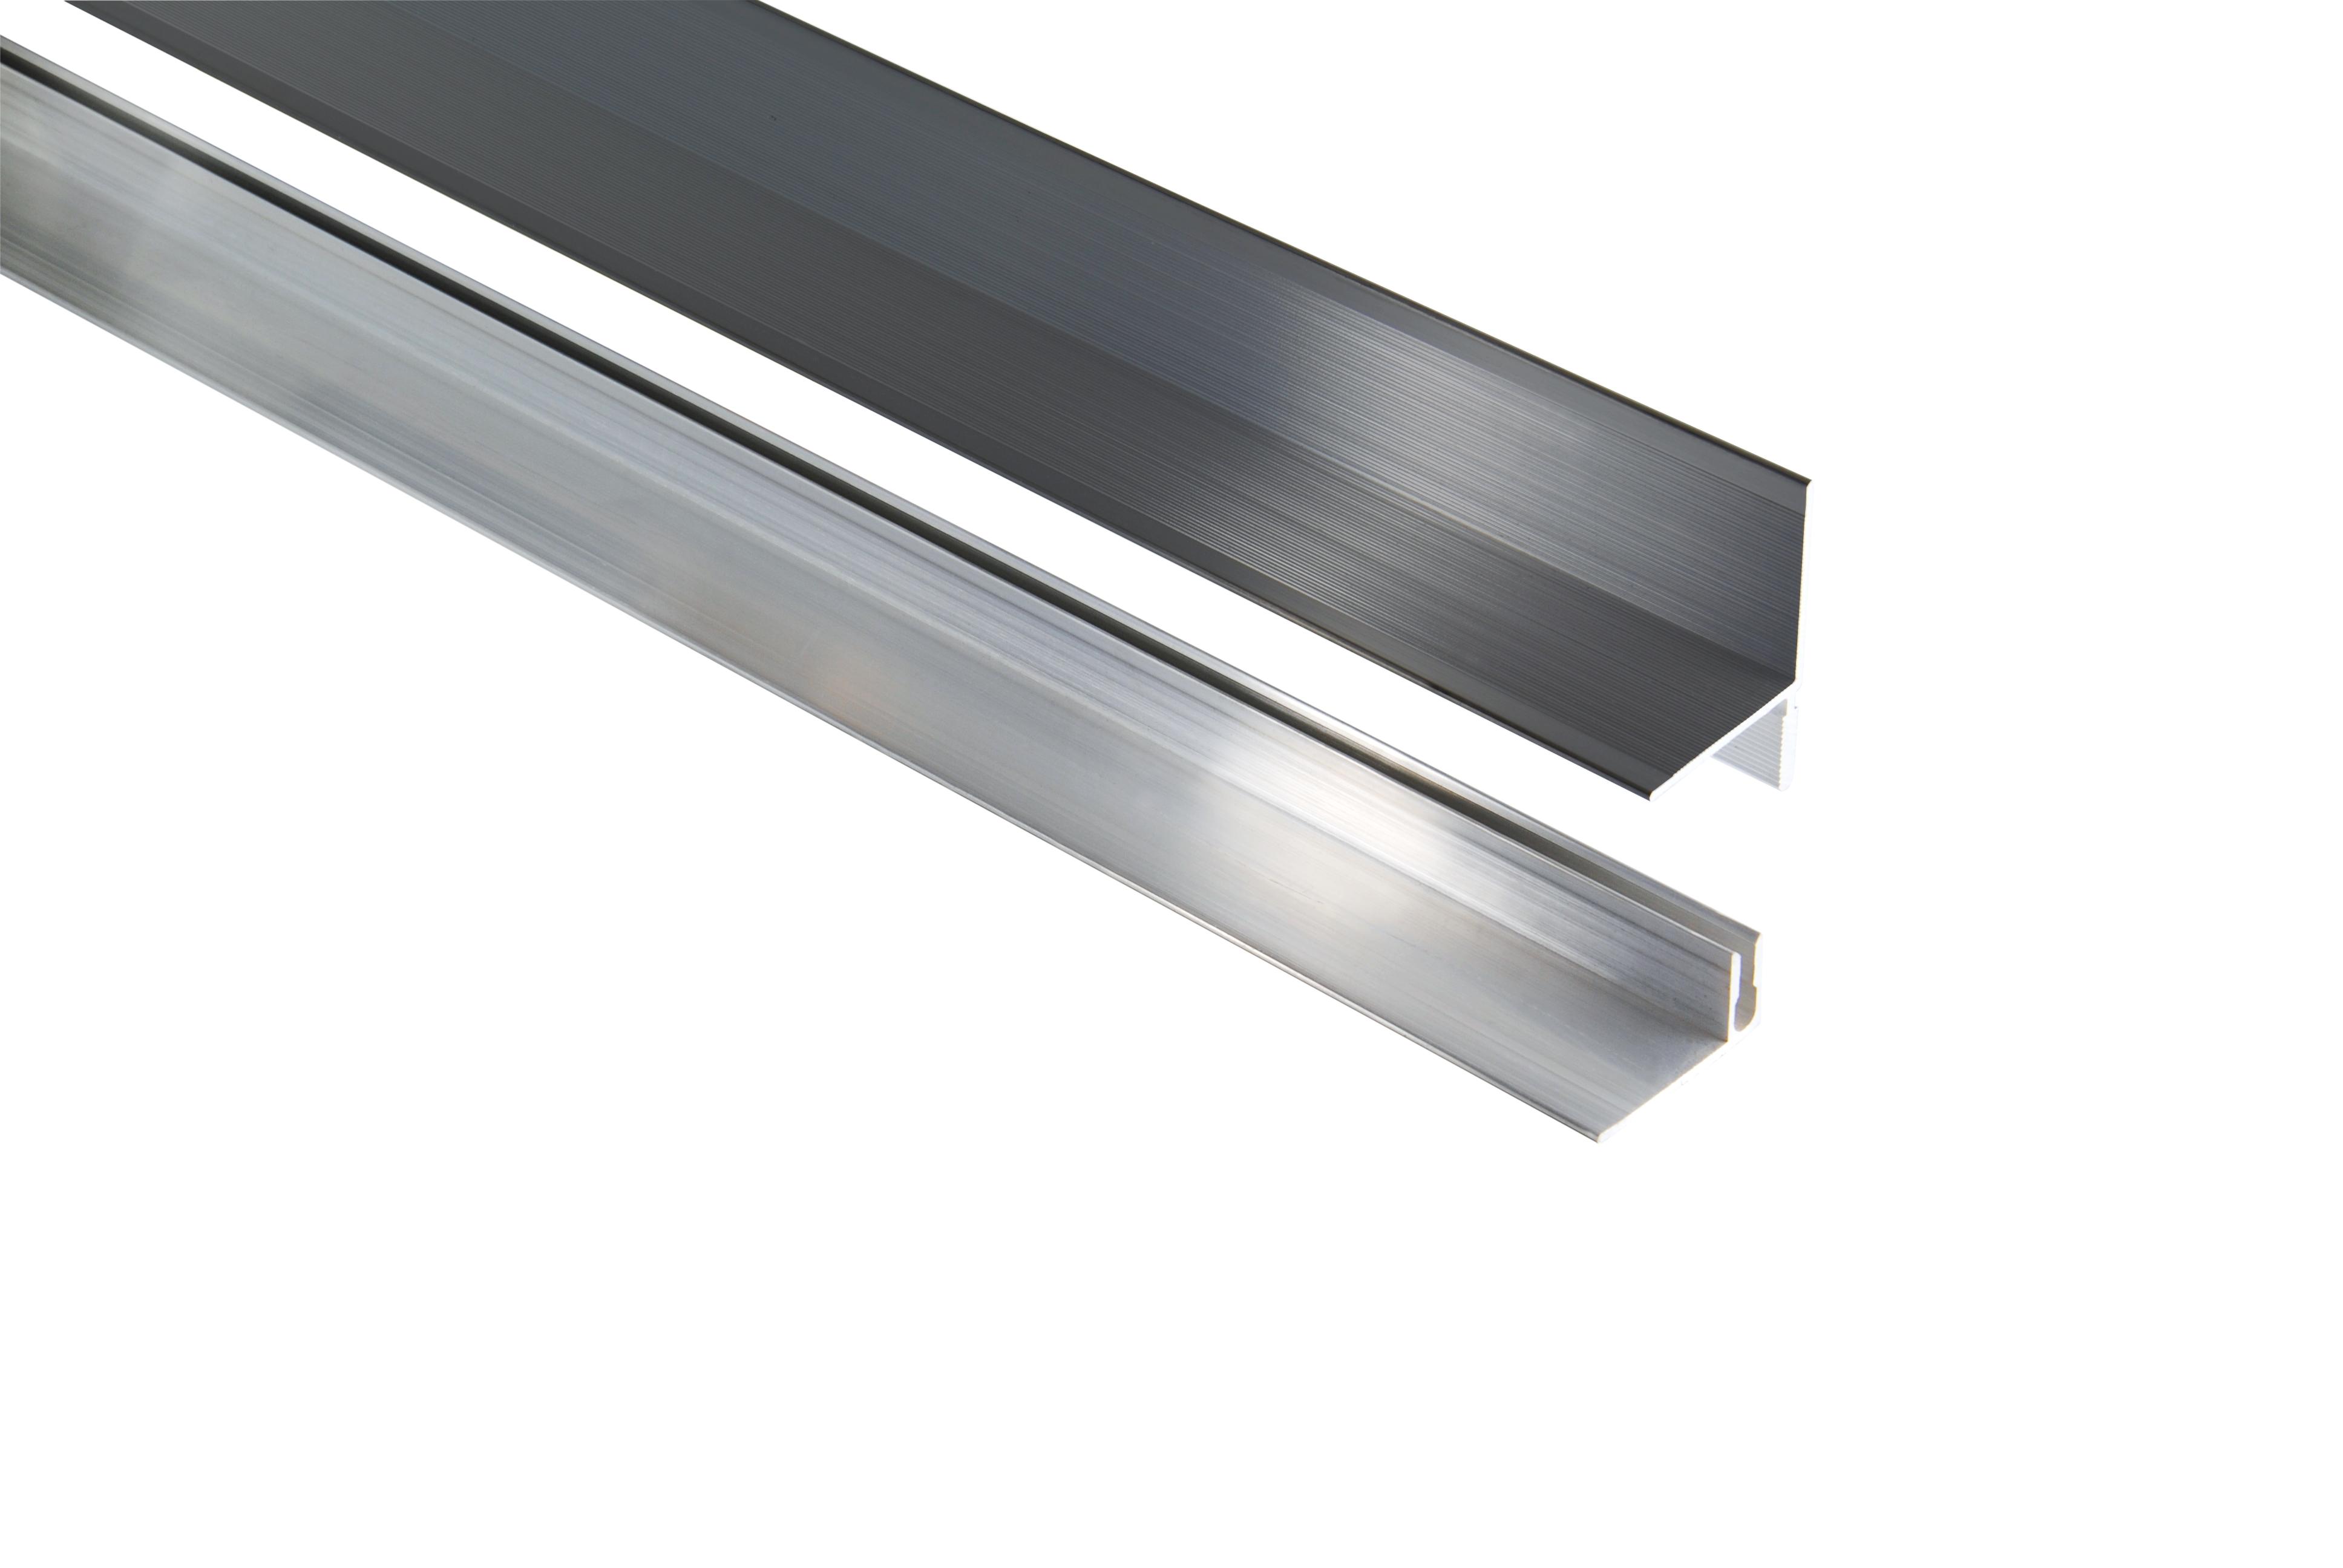 Kovalex Aluminium Wandabschluss mit Befestigungsprofil - Farbe: Anthrazit - Abmessung: 40x60x2.500 mm